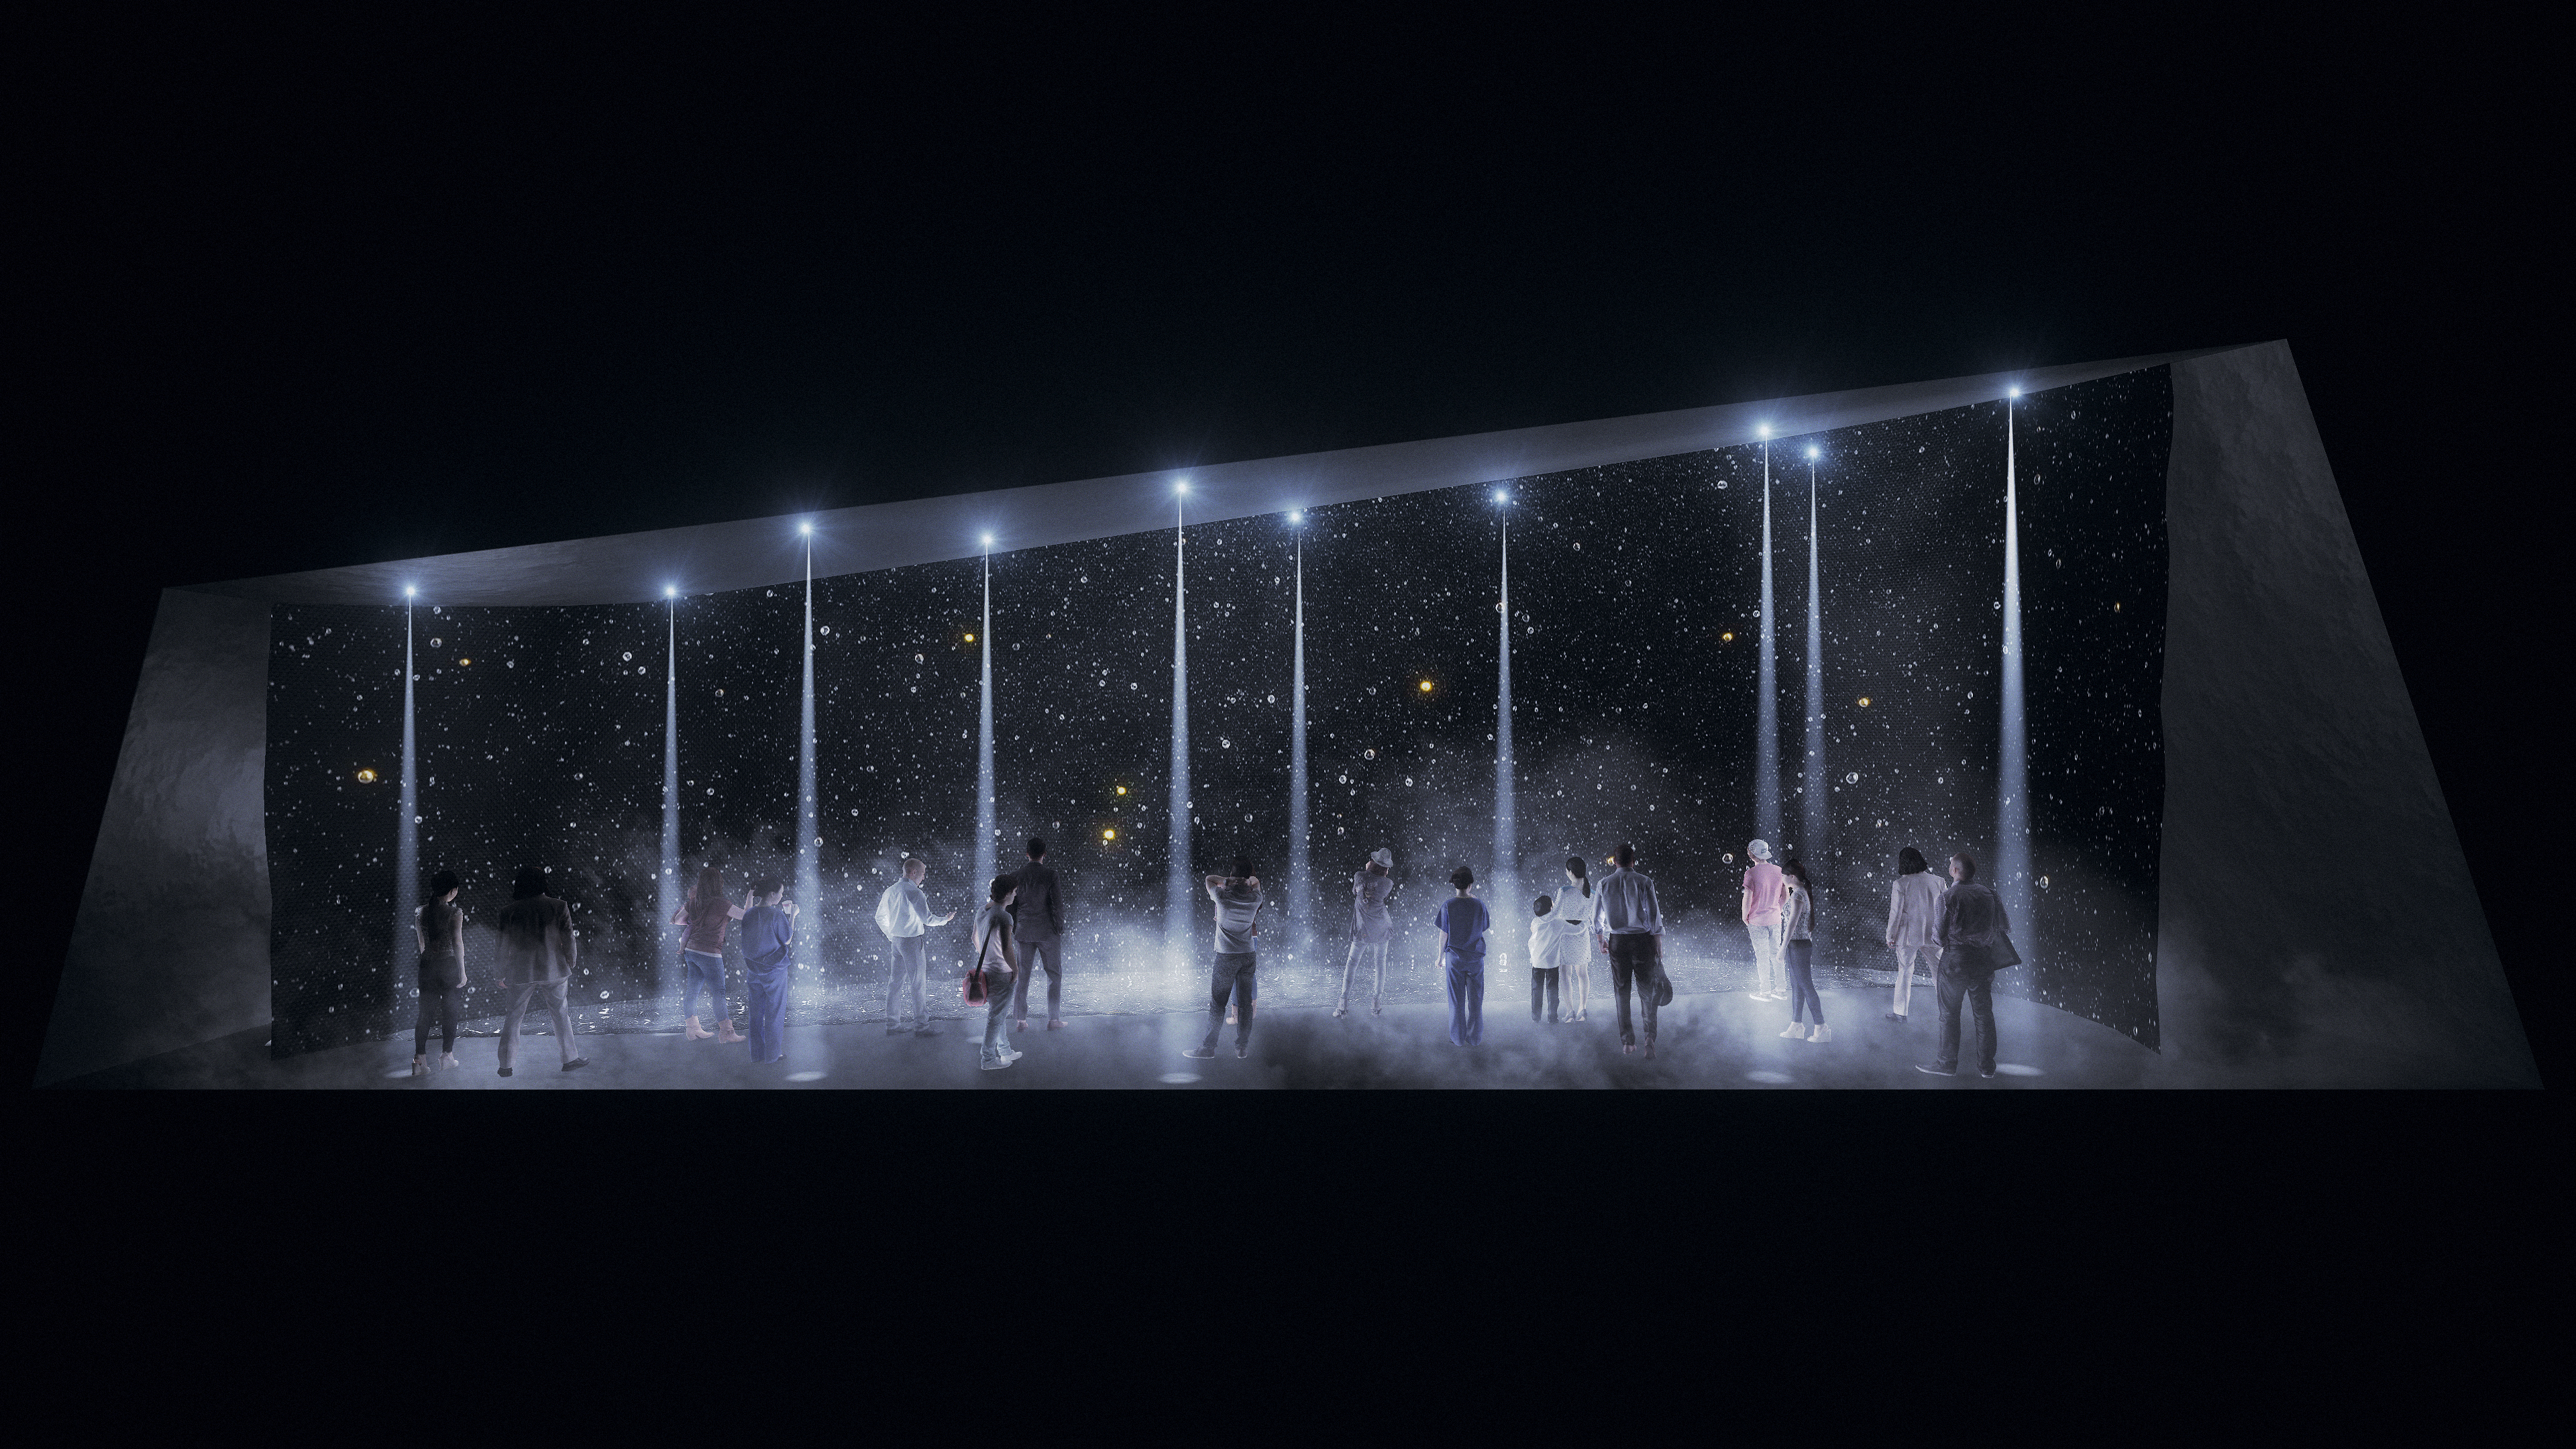 Panasonic's installation image at Milano Salone 2017 (Photo: Business Wire)